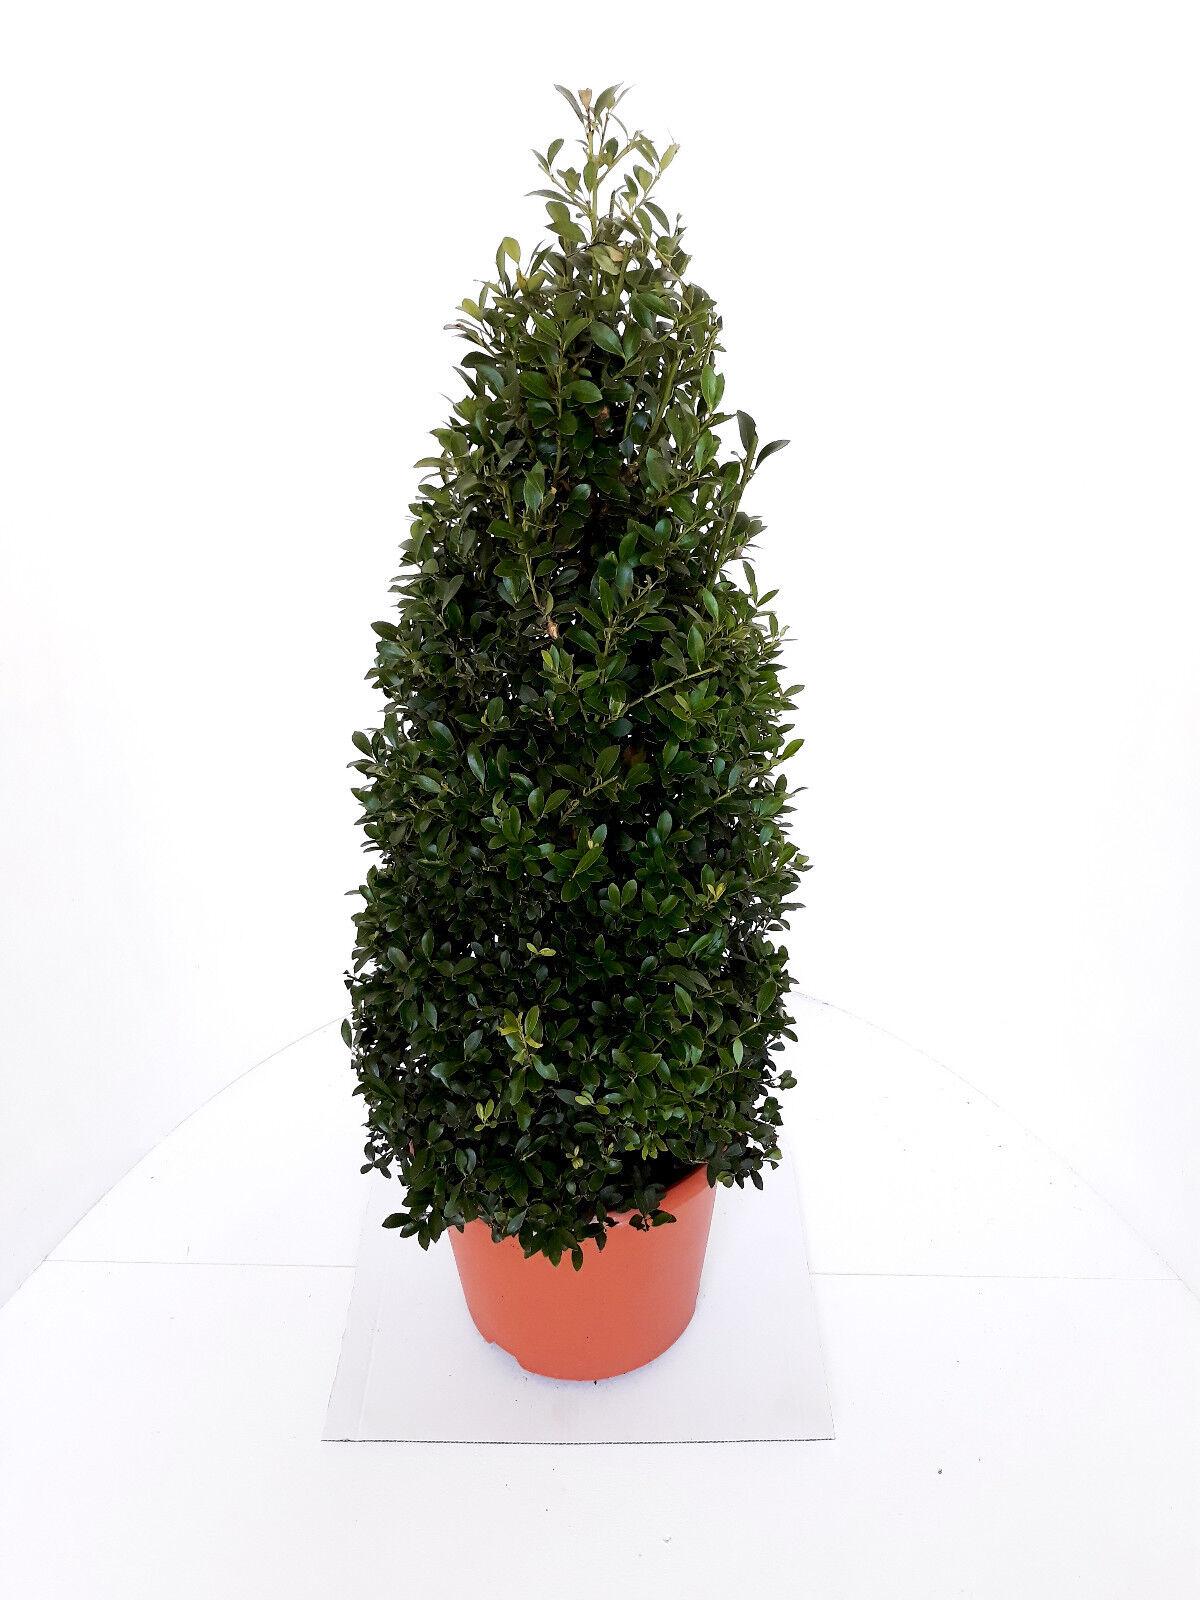 2 x Ilex crenata Stokes, Kegel, Höhe  70-80 cm, Alternative Buchsbaum + Dünger